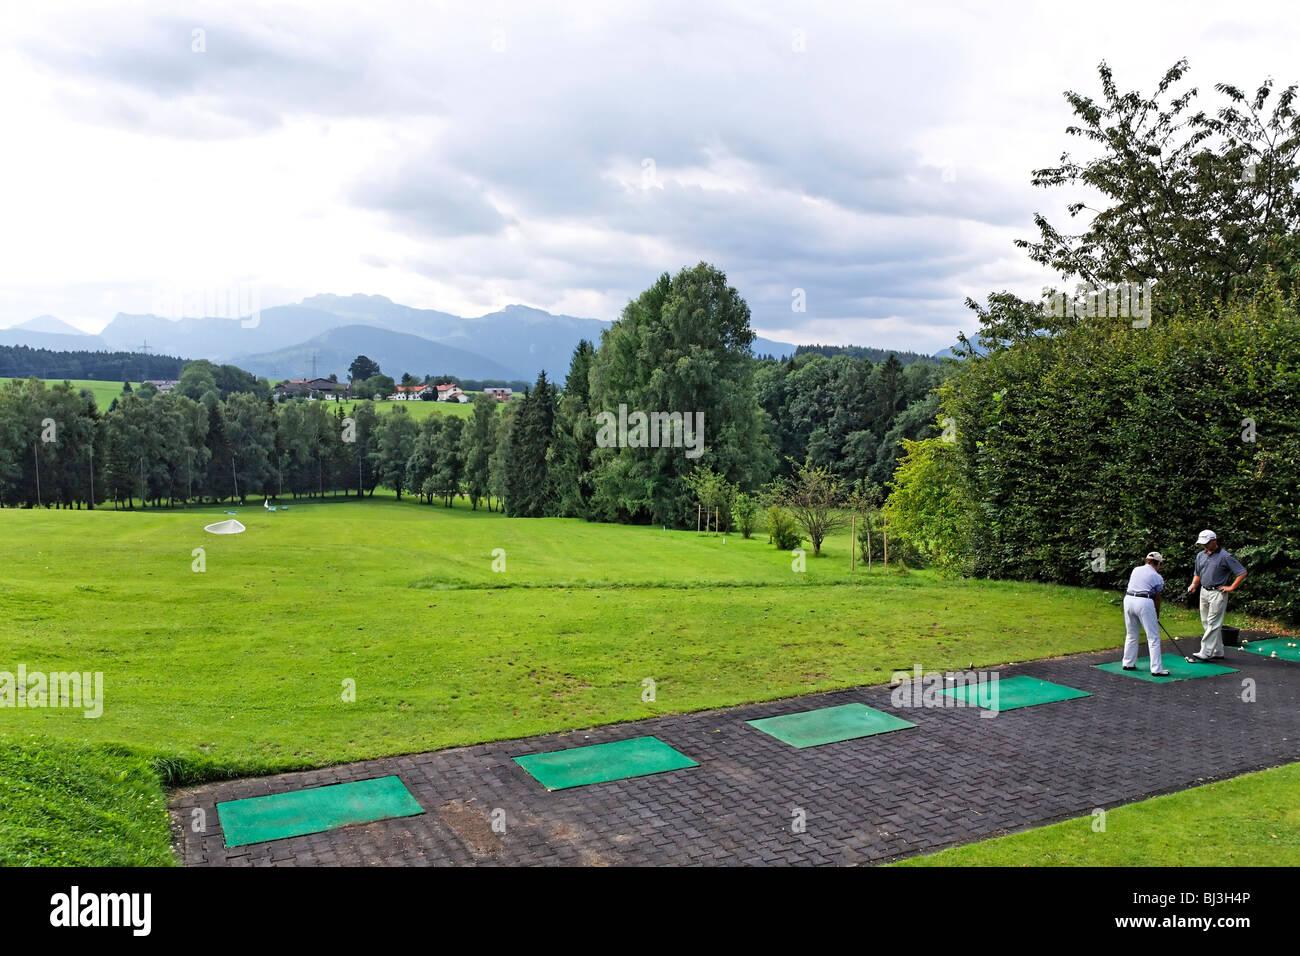 Prien Golf Course Driving Range, Chiemgau Upper Bavaria Germany - Stock Image